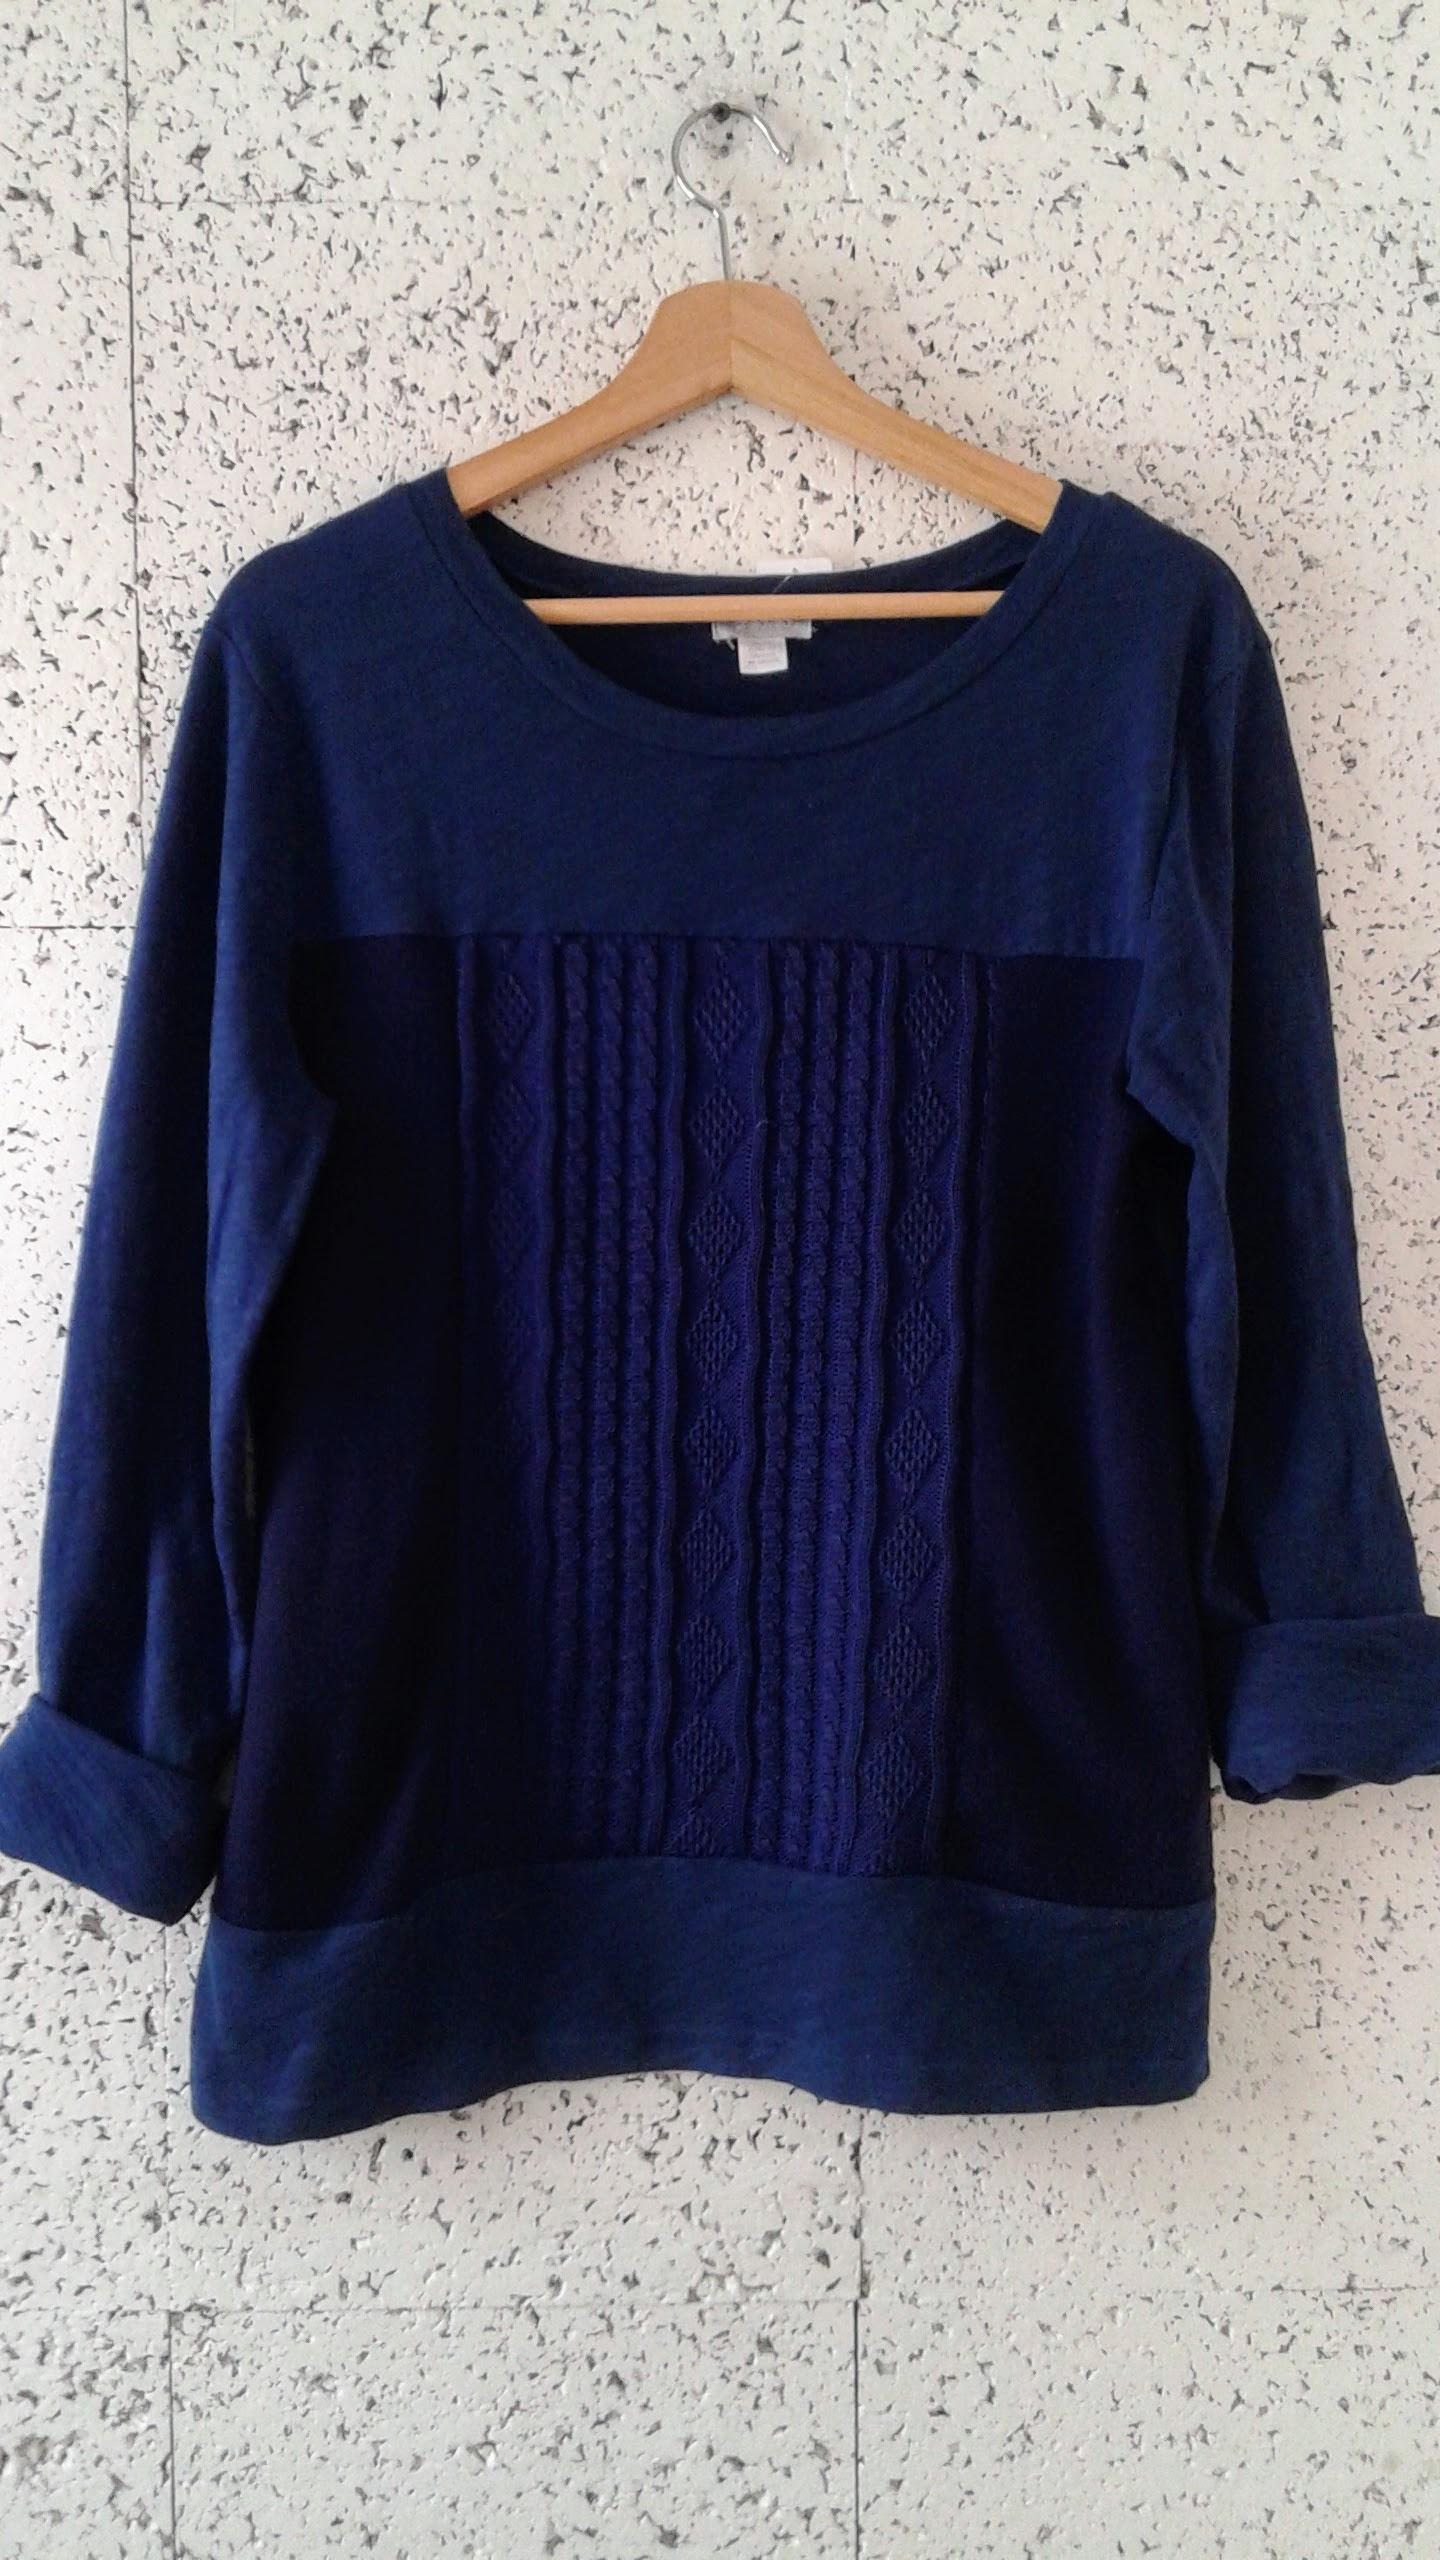 Preloved top; Size M, $34